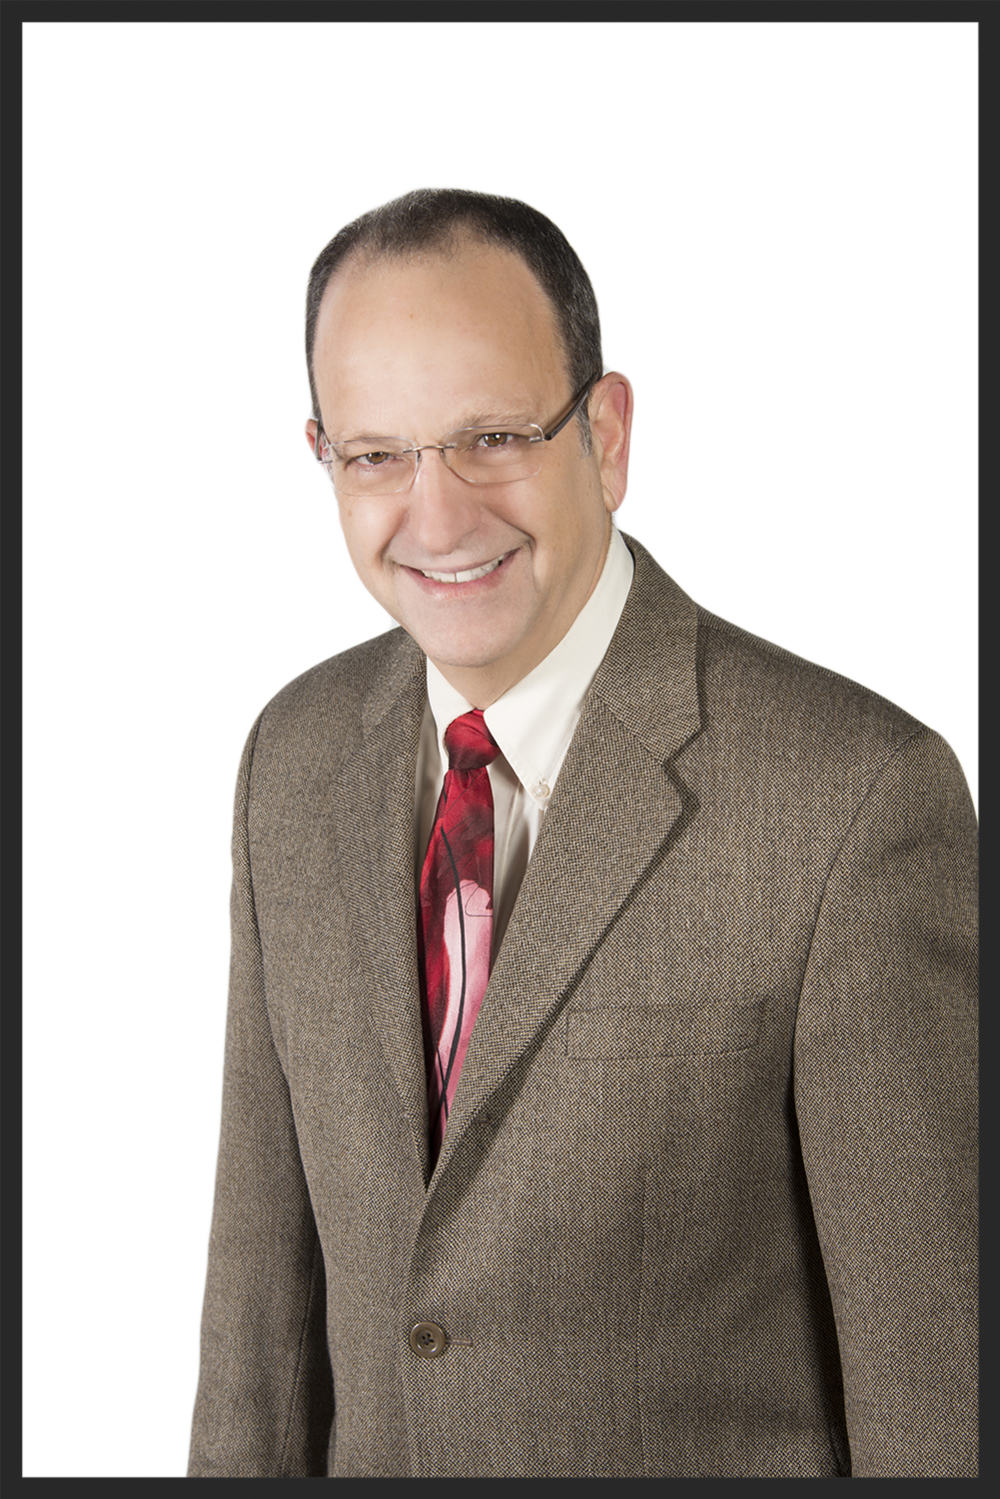 Joel Siegel LB.png